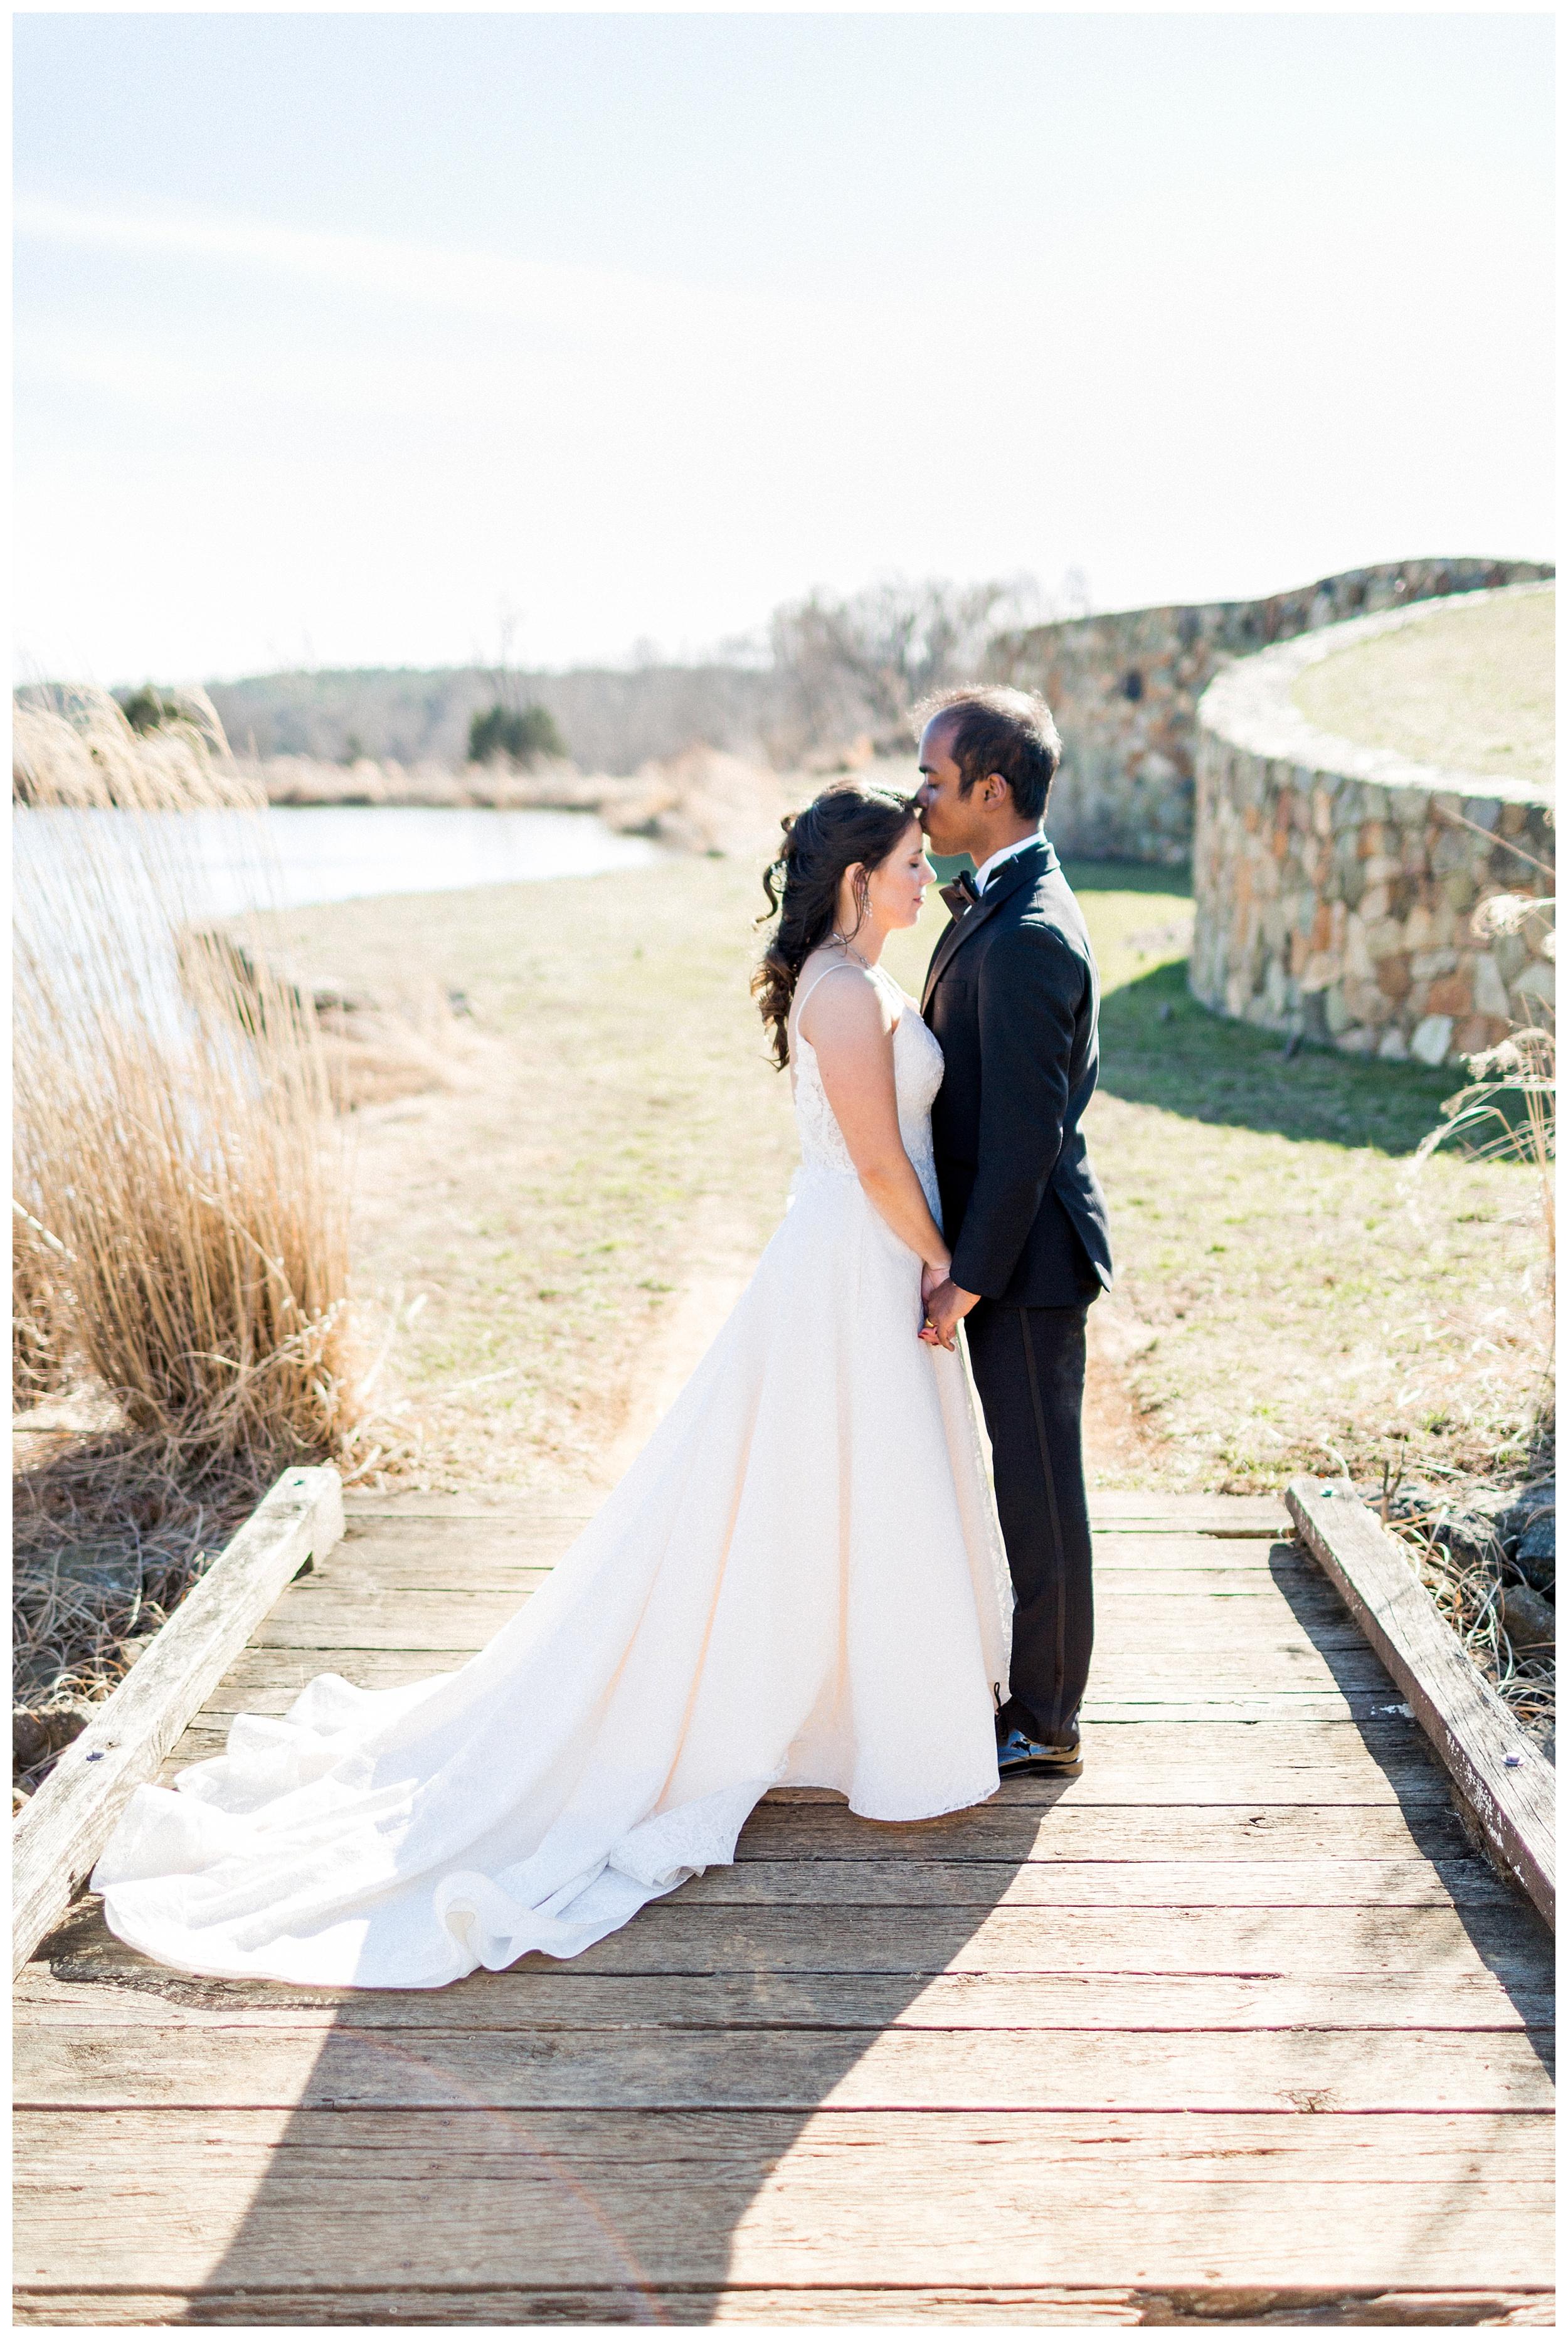 Stone Tower Winery Wedding | Virginia Winter Wedding | VA Wedding Photographer Kir Tuben_0045.jpg